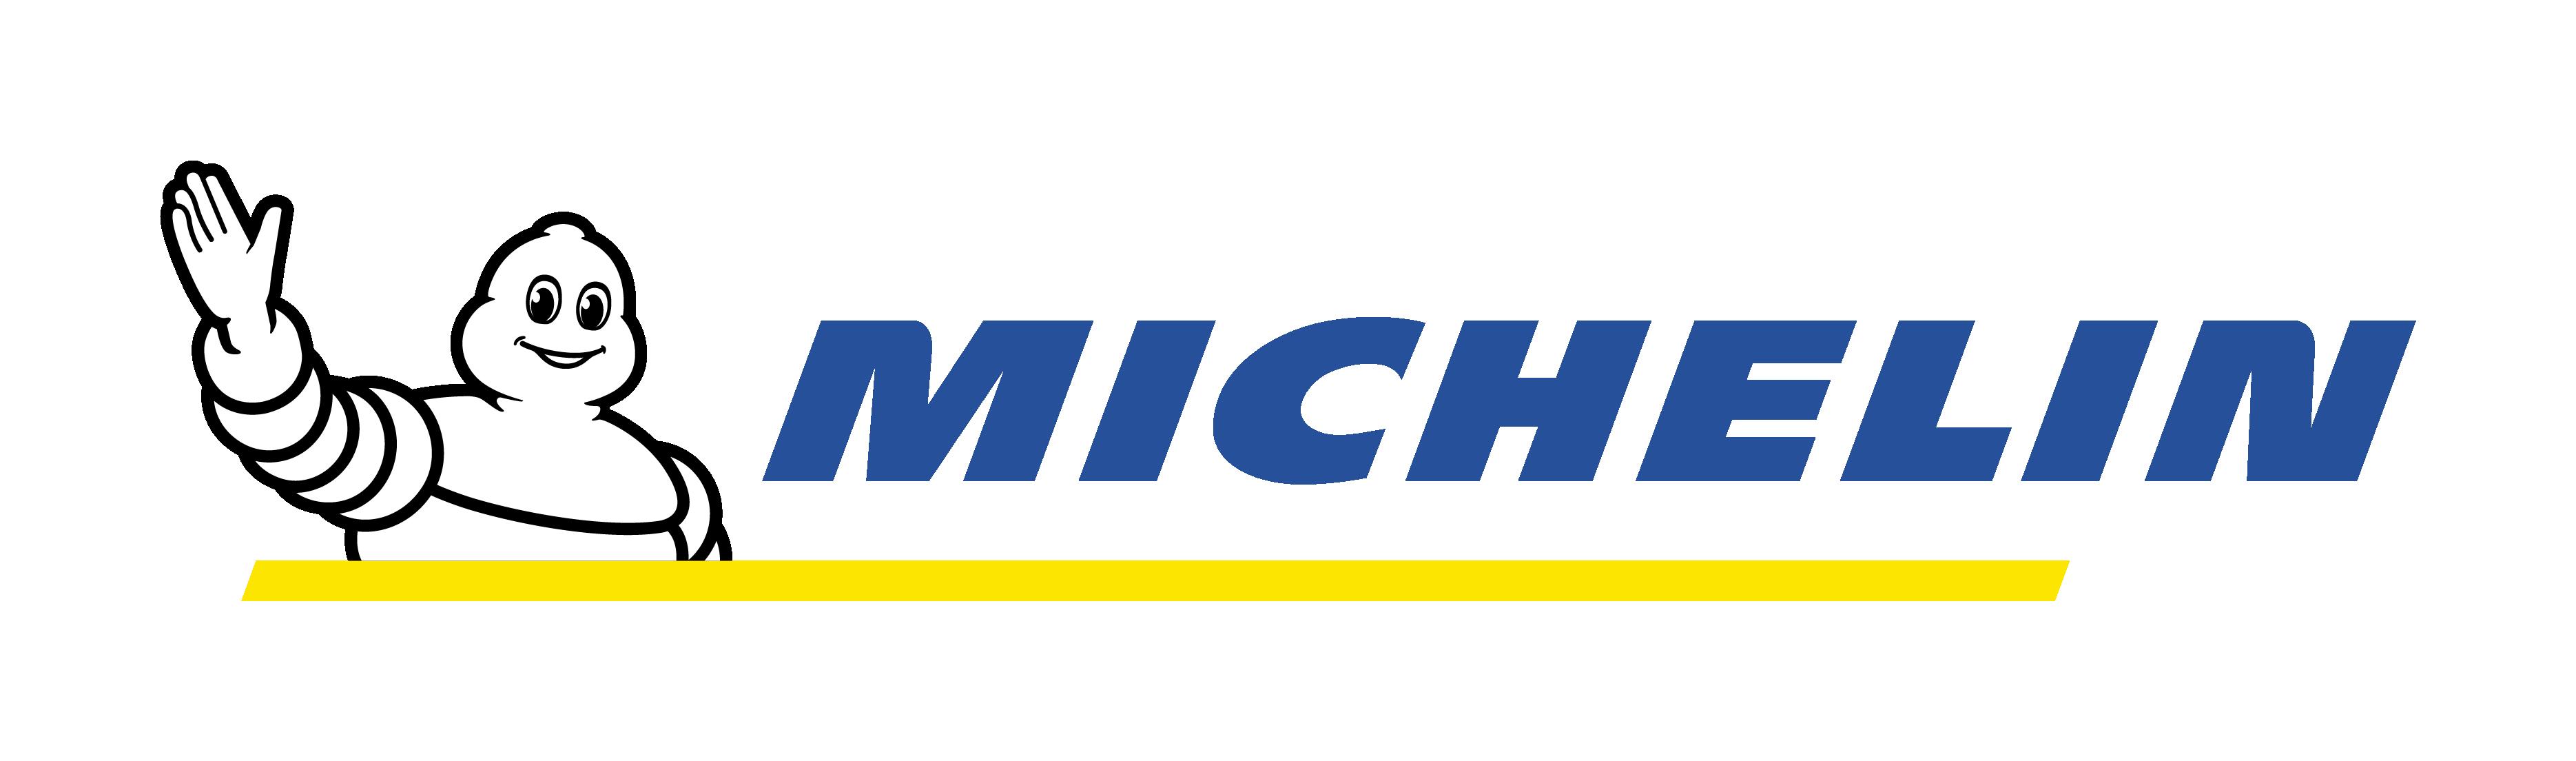 Michelin Tires Logo Vector PNG-PlusPNG.com-3739 - Michelin Tires Logo Vector PNG